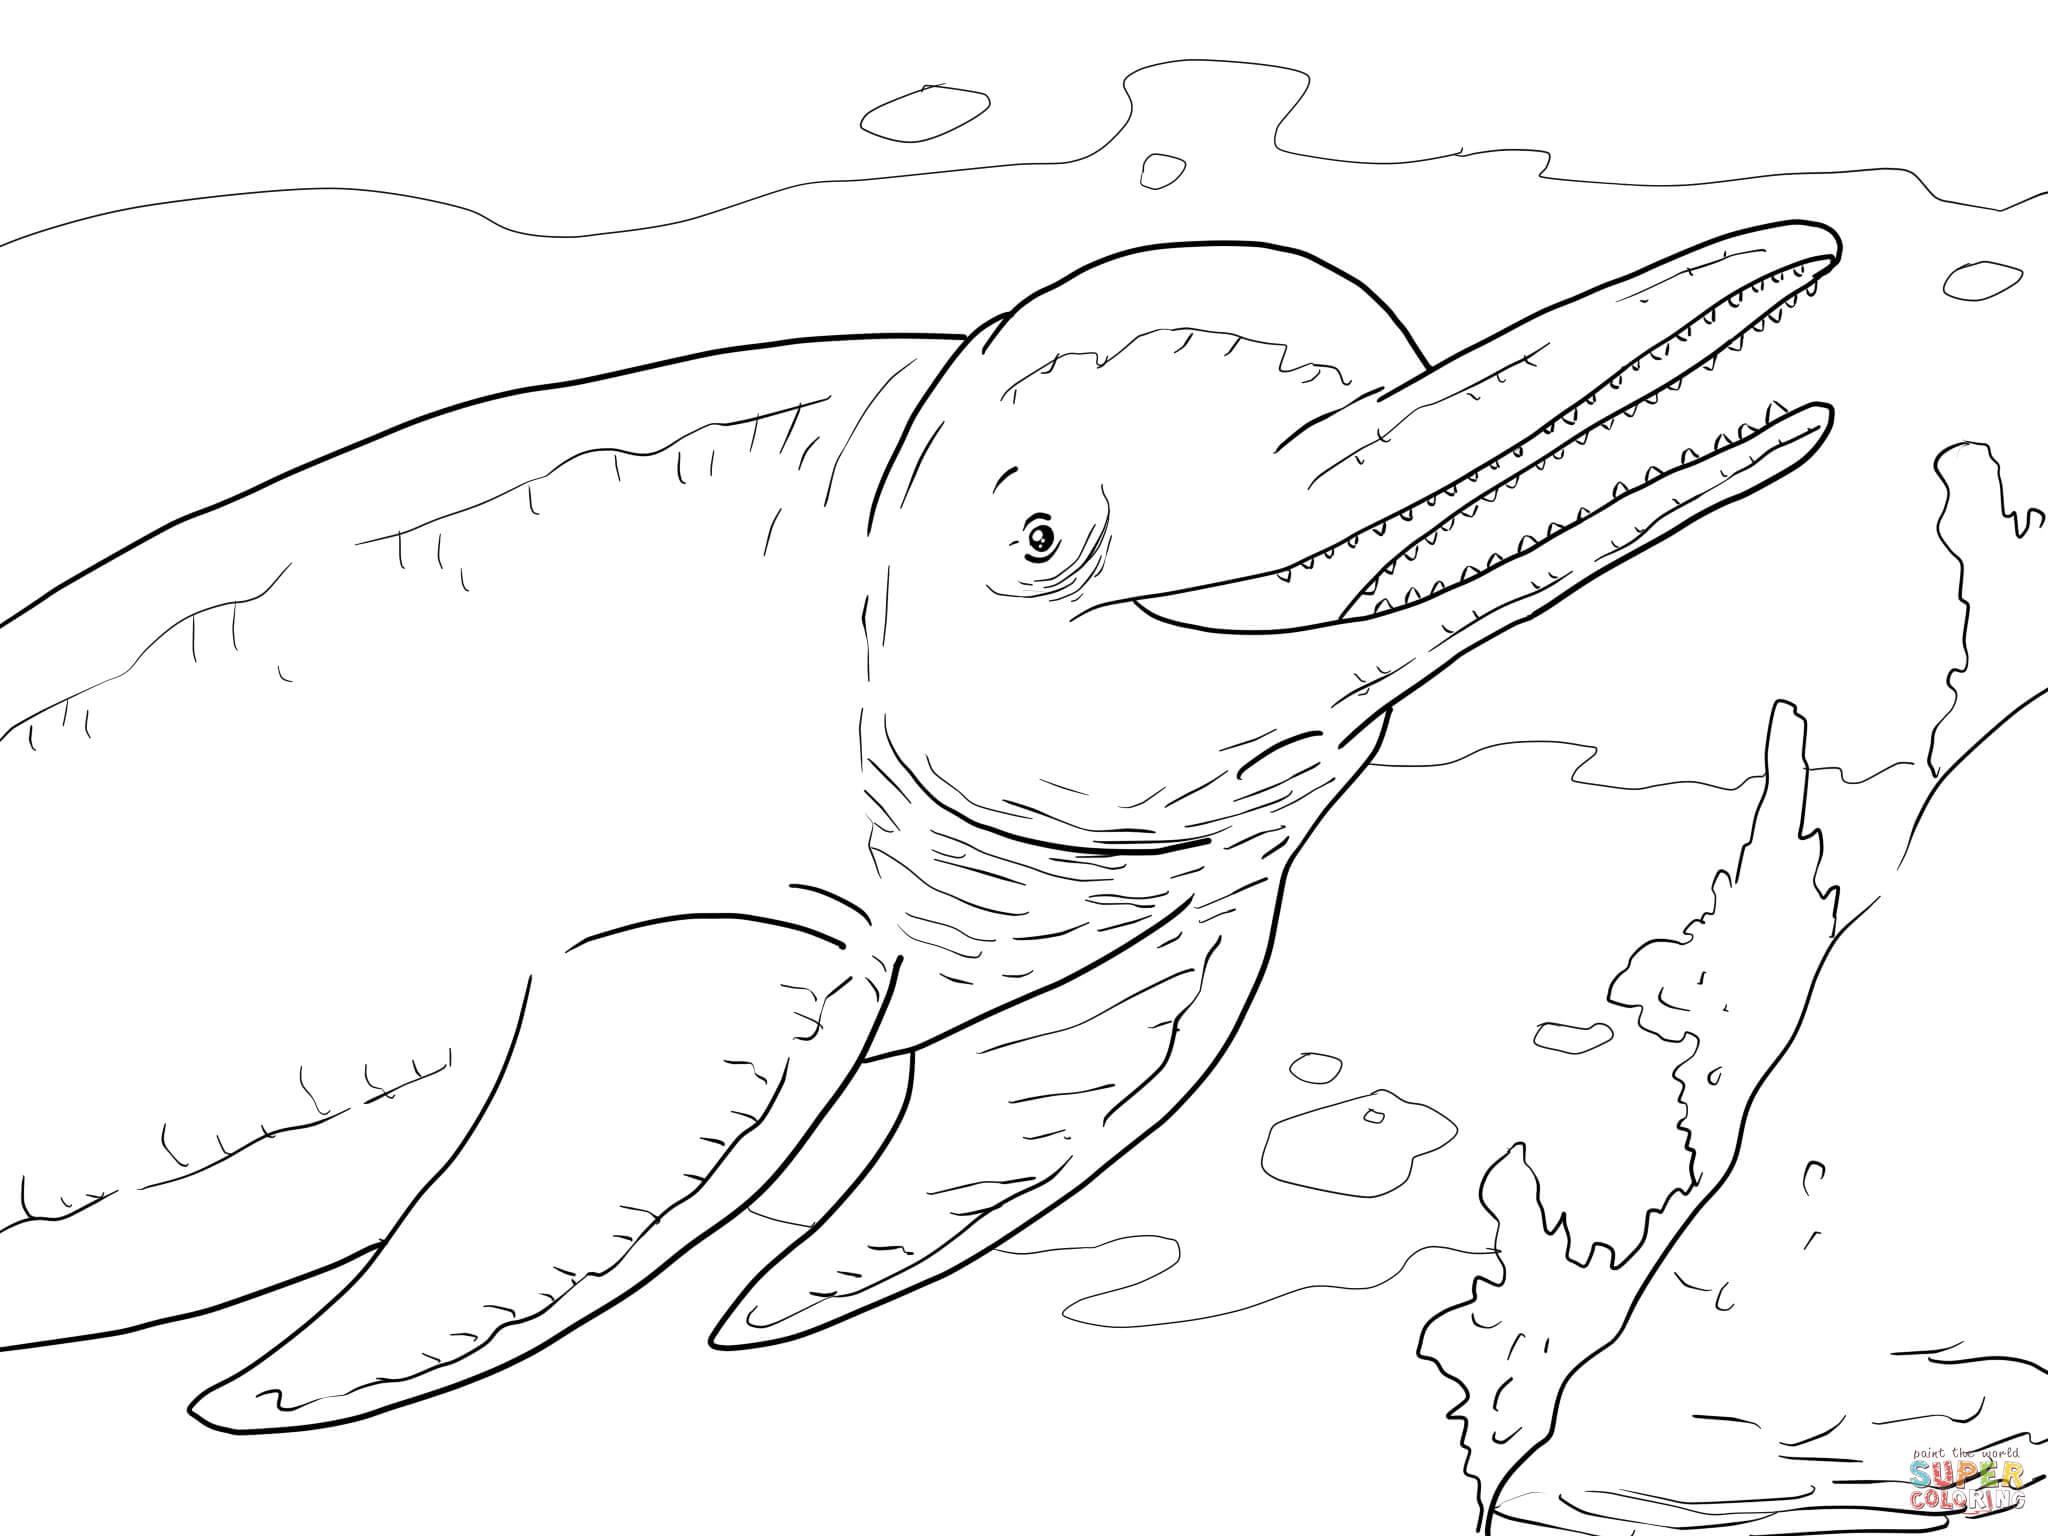 Boto oder Amazonasdelfin